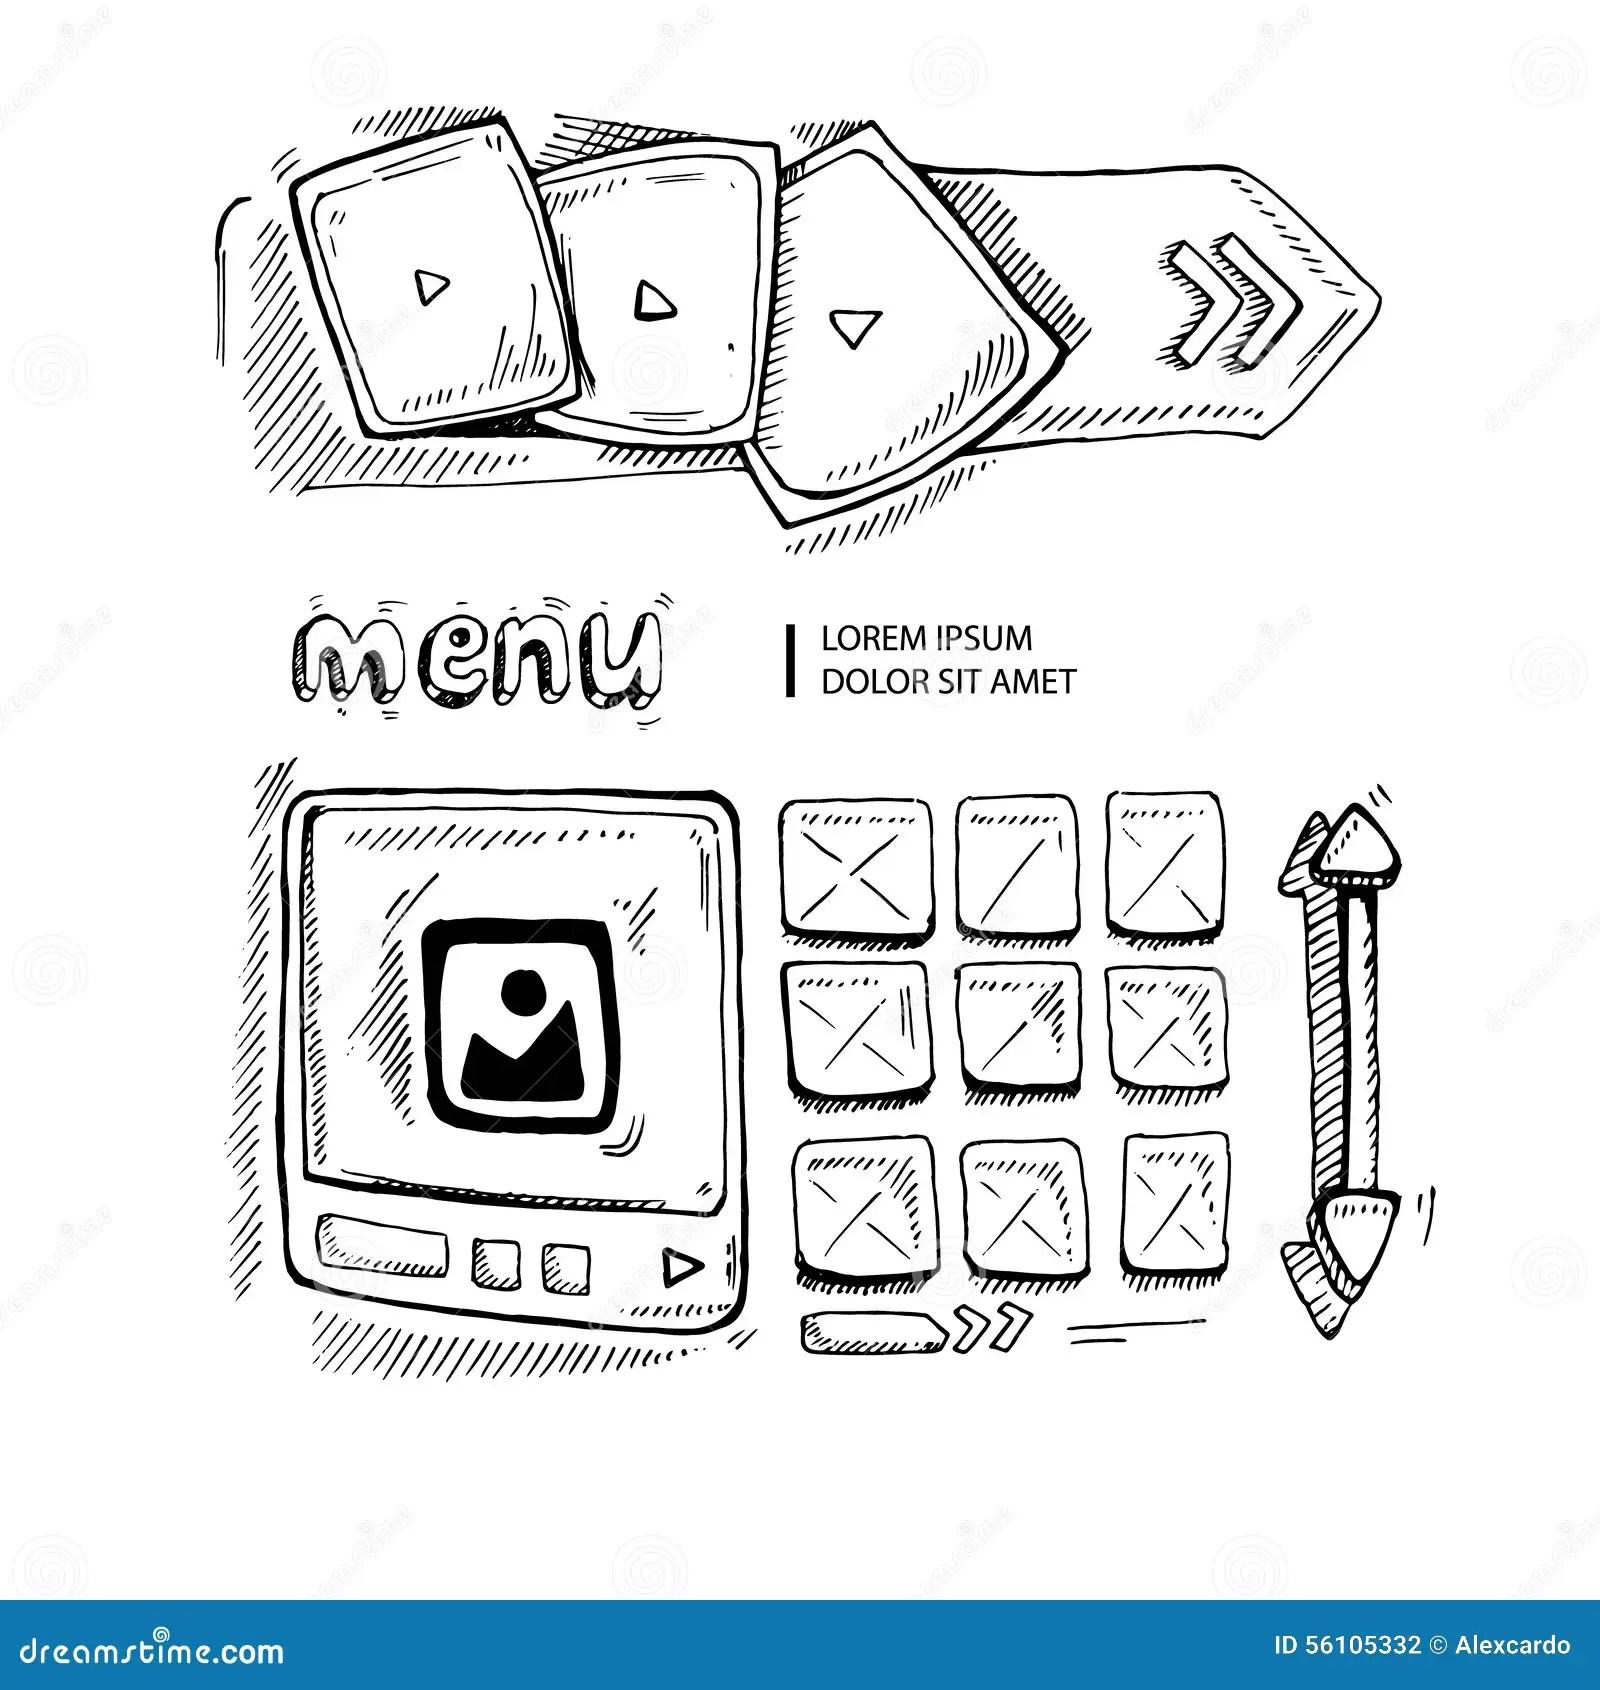 Doodle portfolio wireframe stock vector. Illustration of